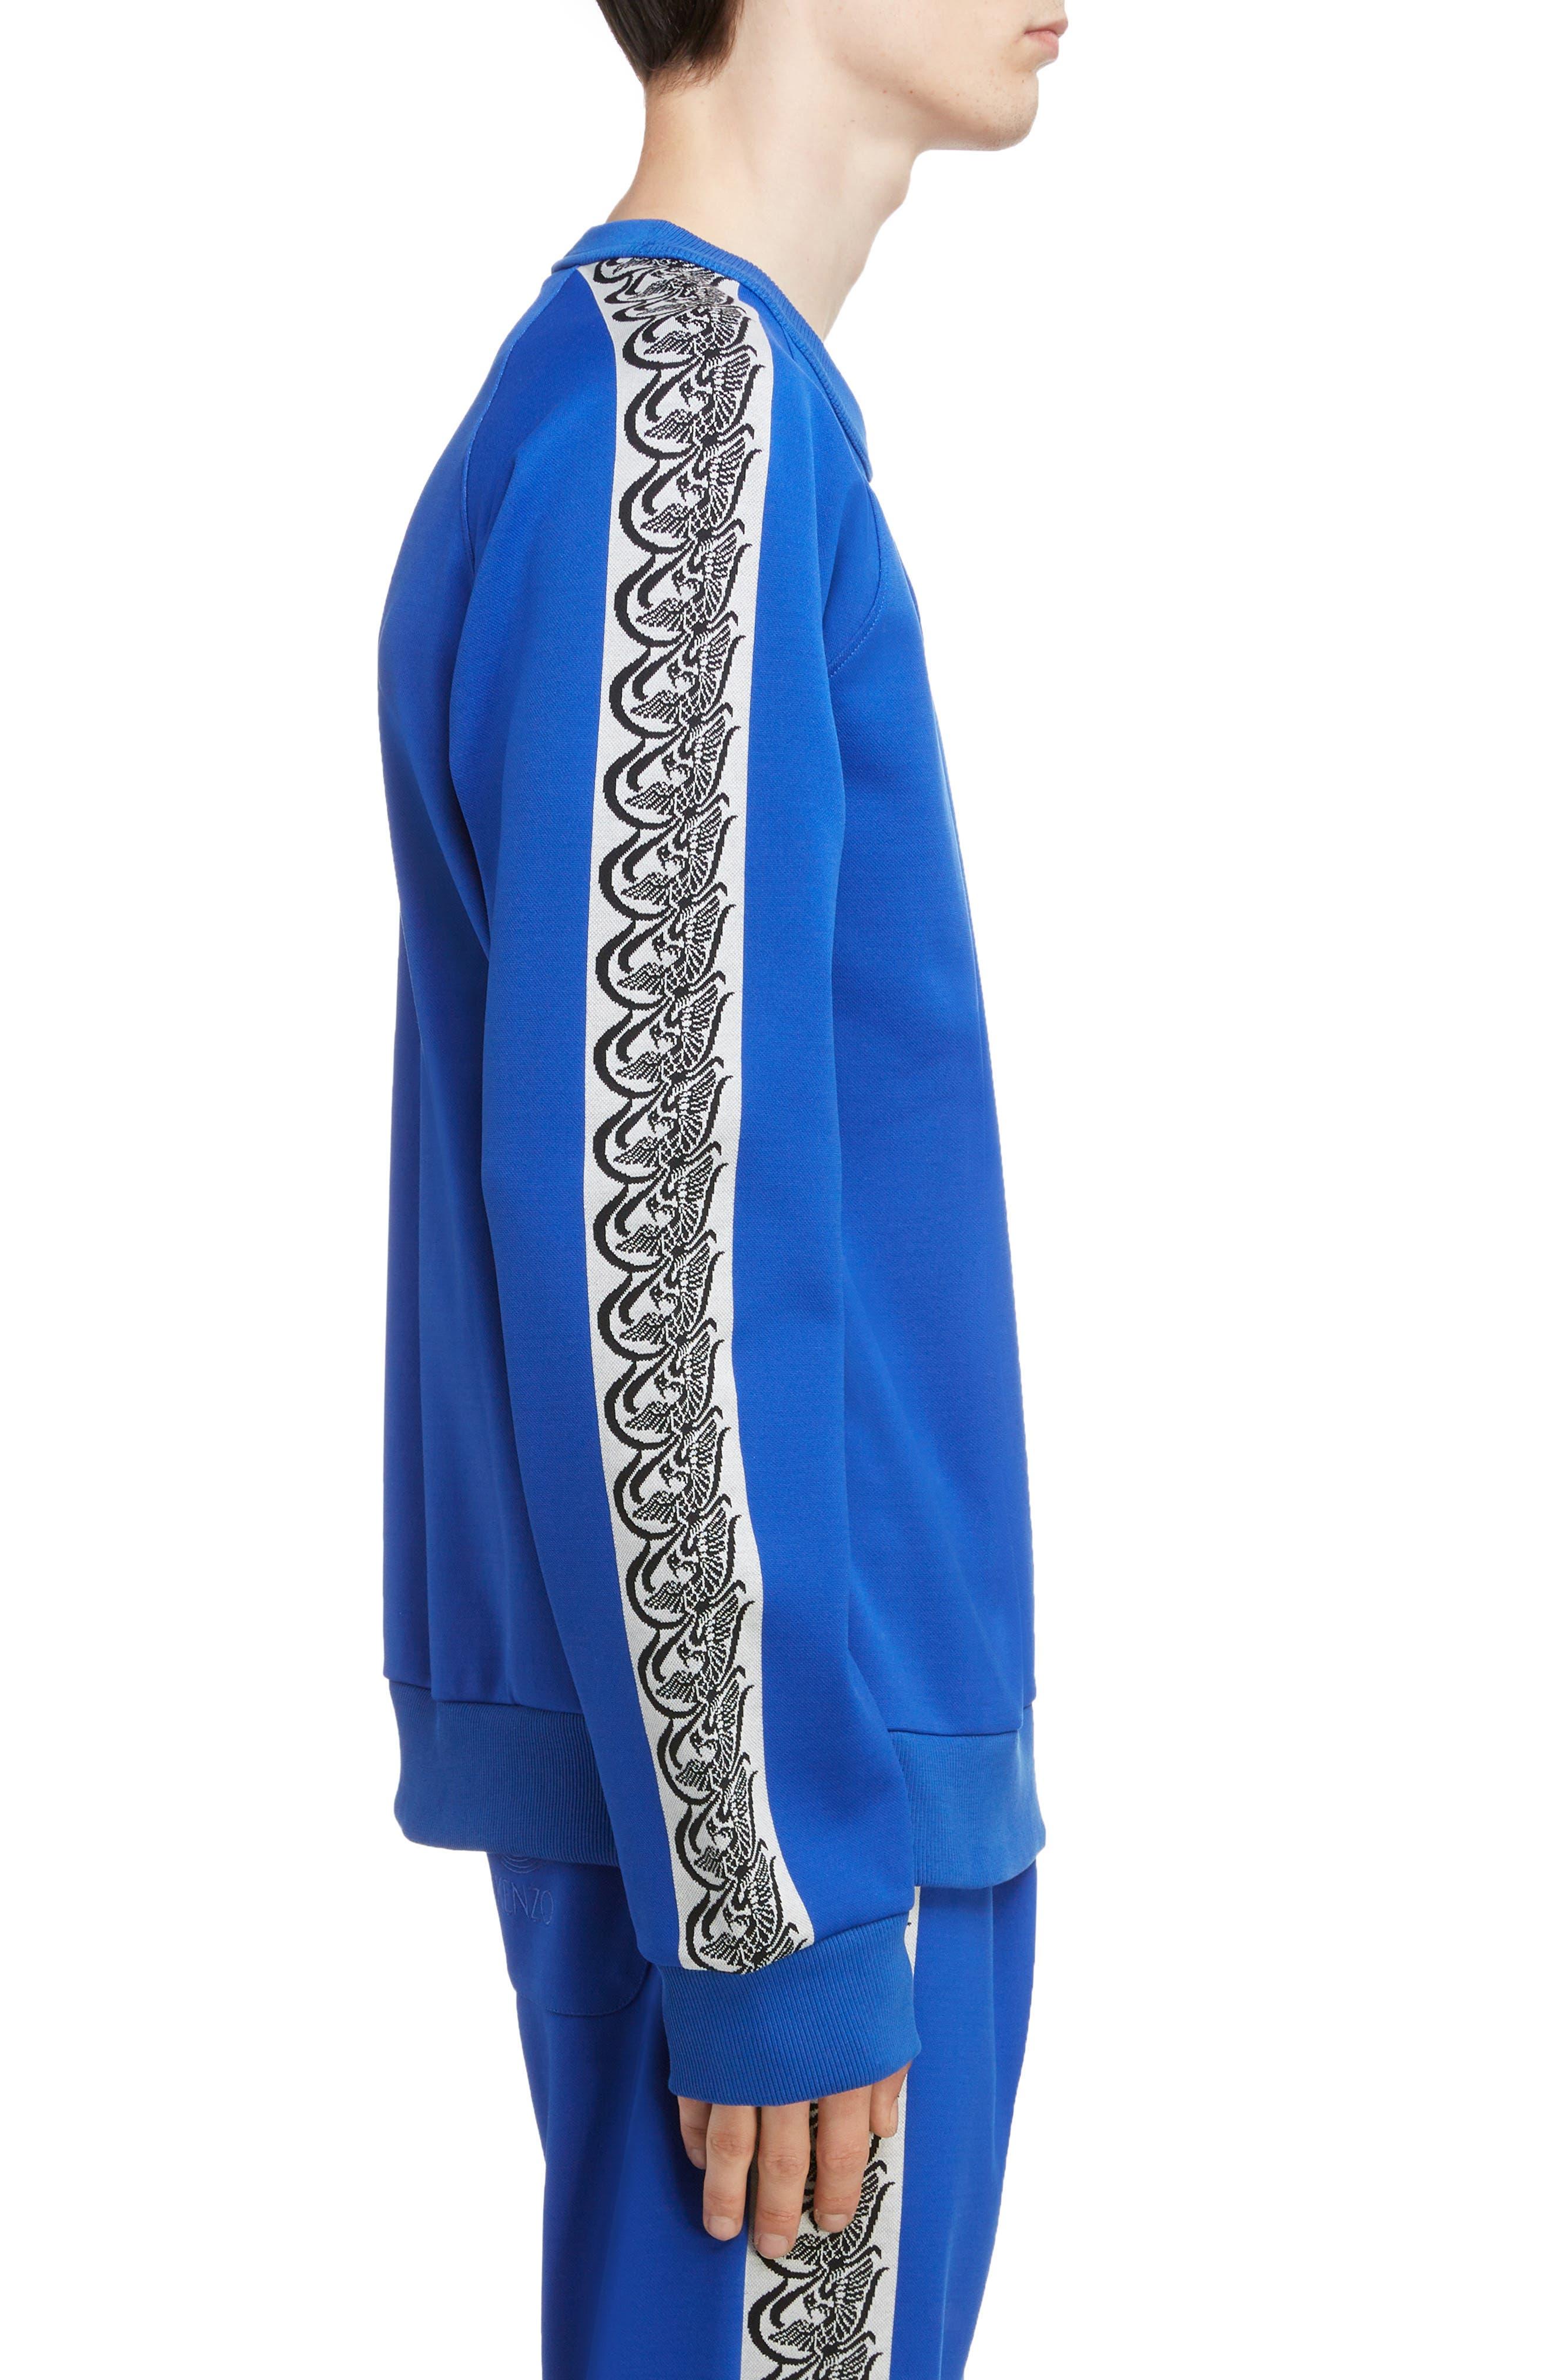 KENZO, Jacquard Raglan Sweatshirt, Alternate thumbnail 3, color, FRENCH BLUE